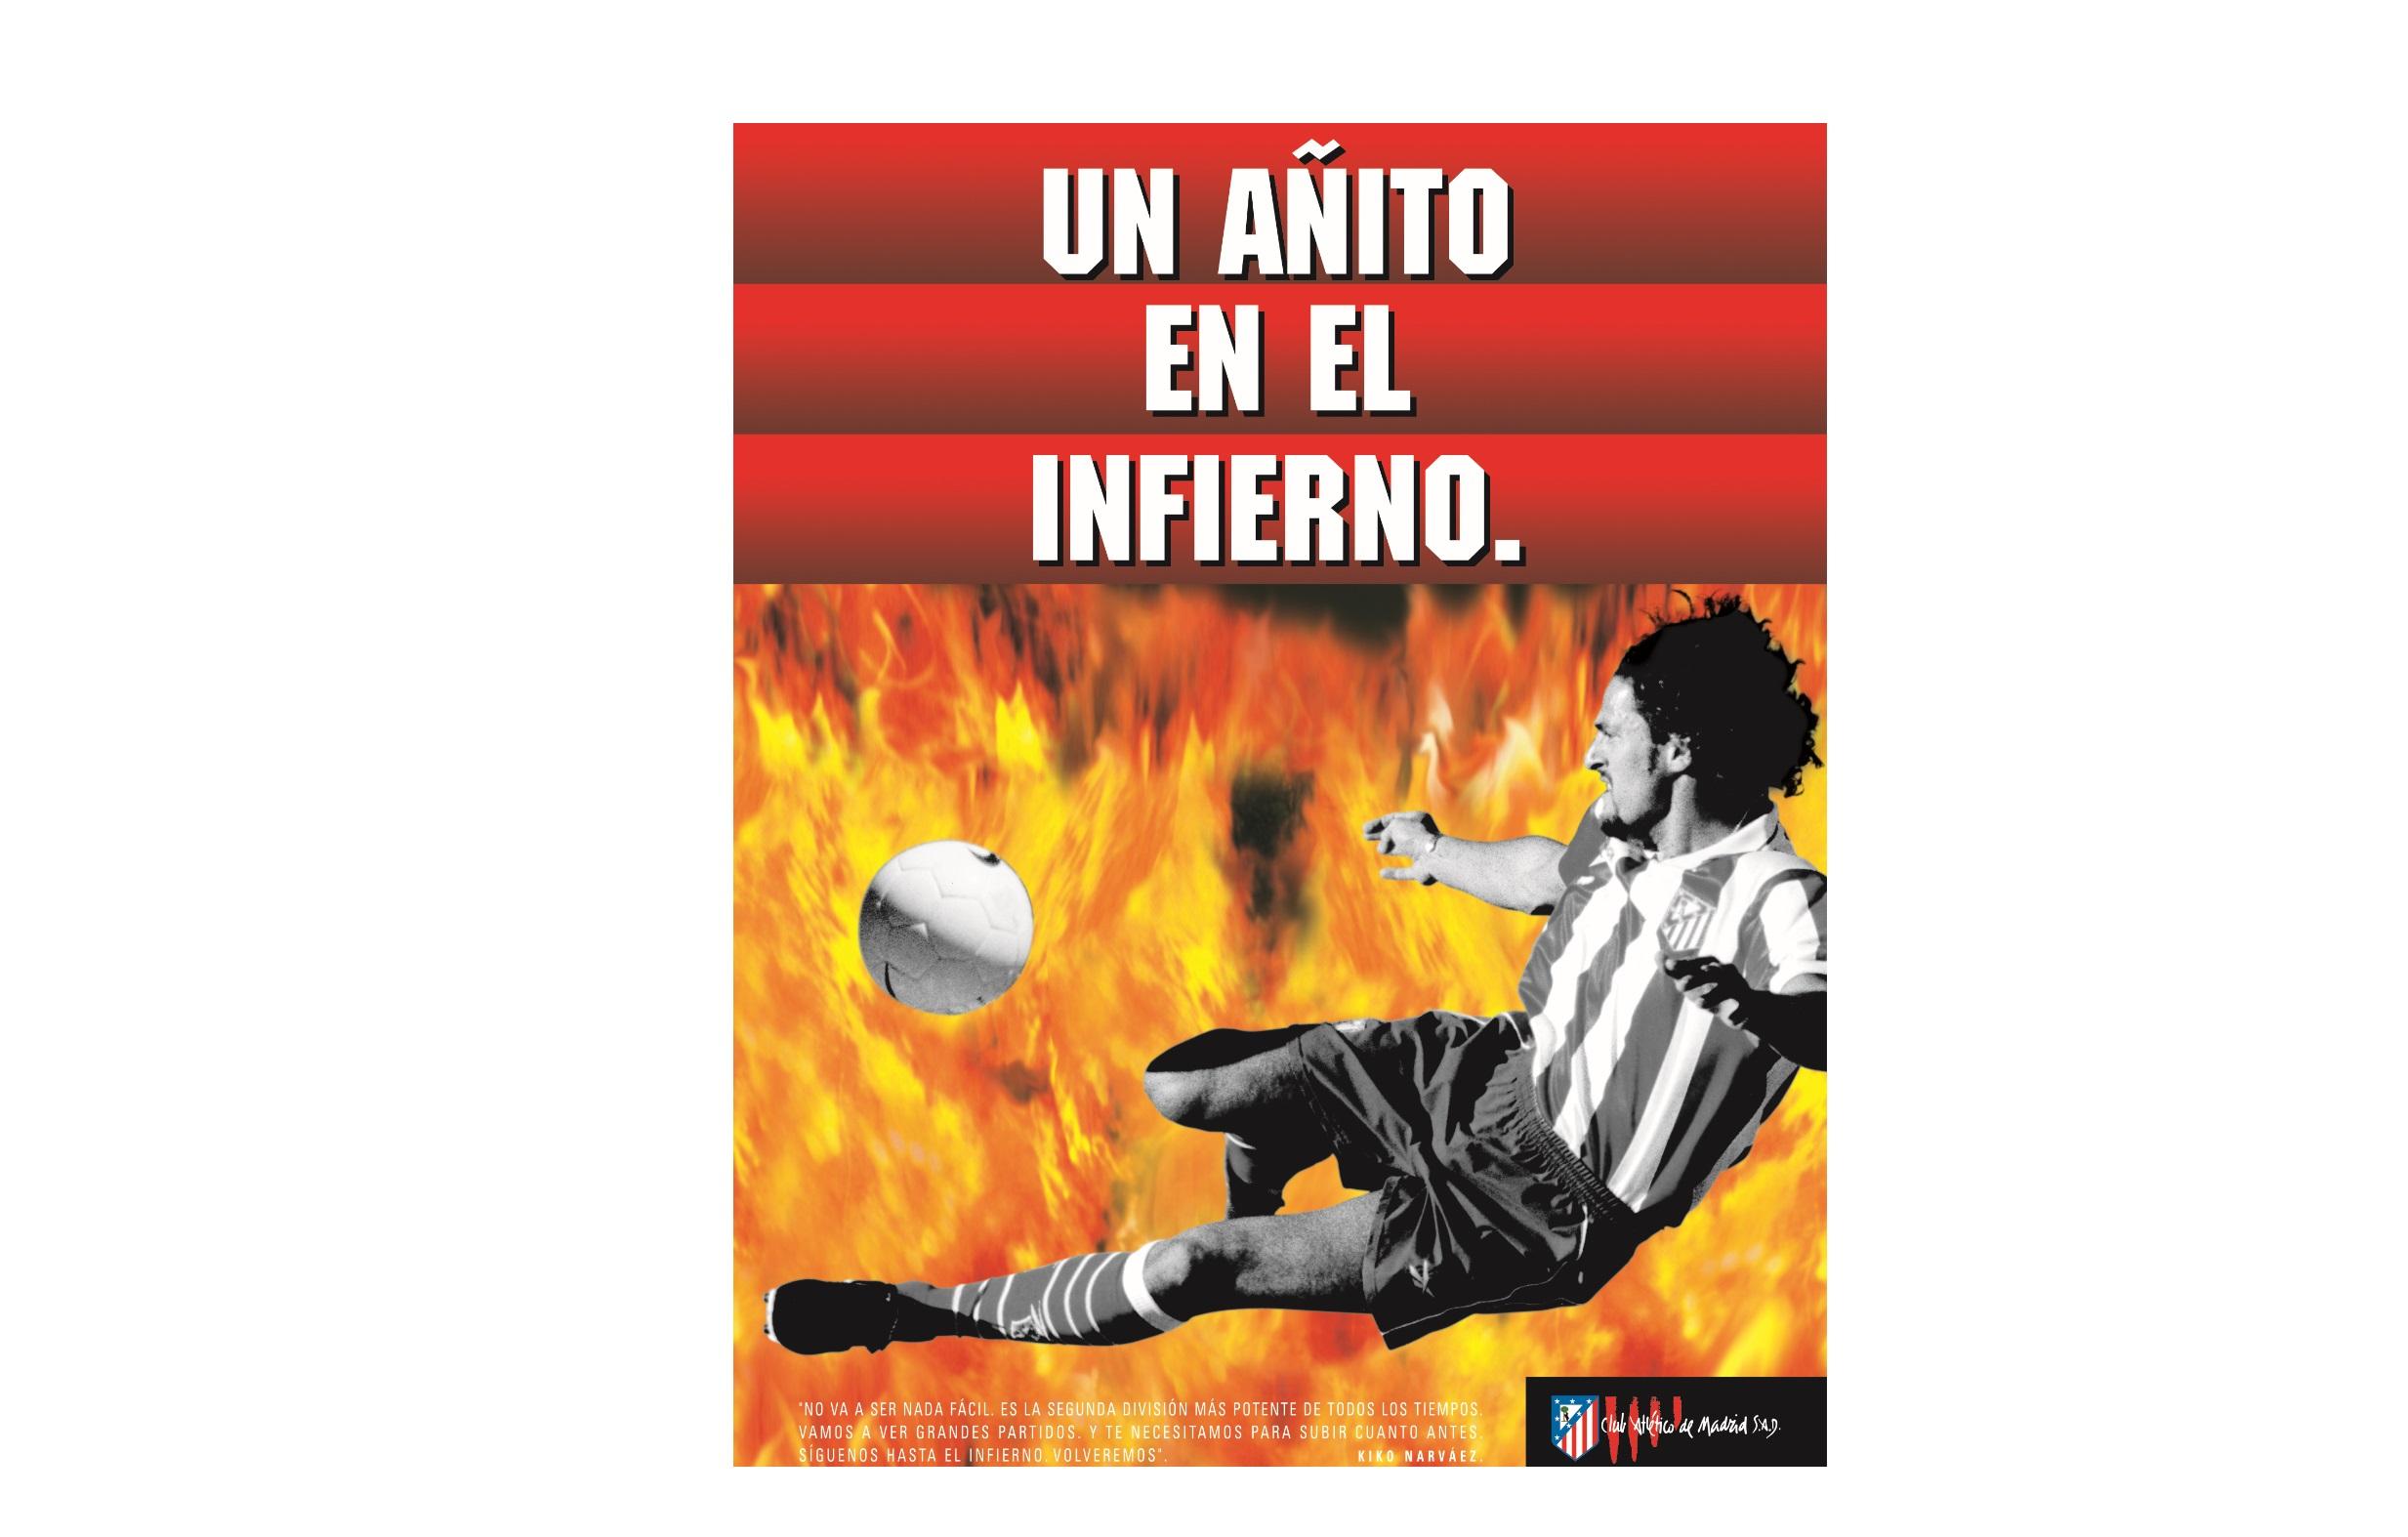 https://www.programapublicidad.com/wp-content/uploads/2020/09/sra-rushmore-añito-infierno-atleti-atletico-madrid-programapublicidad.jpg